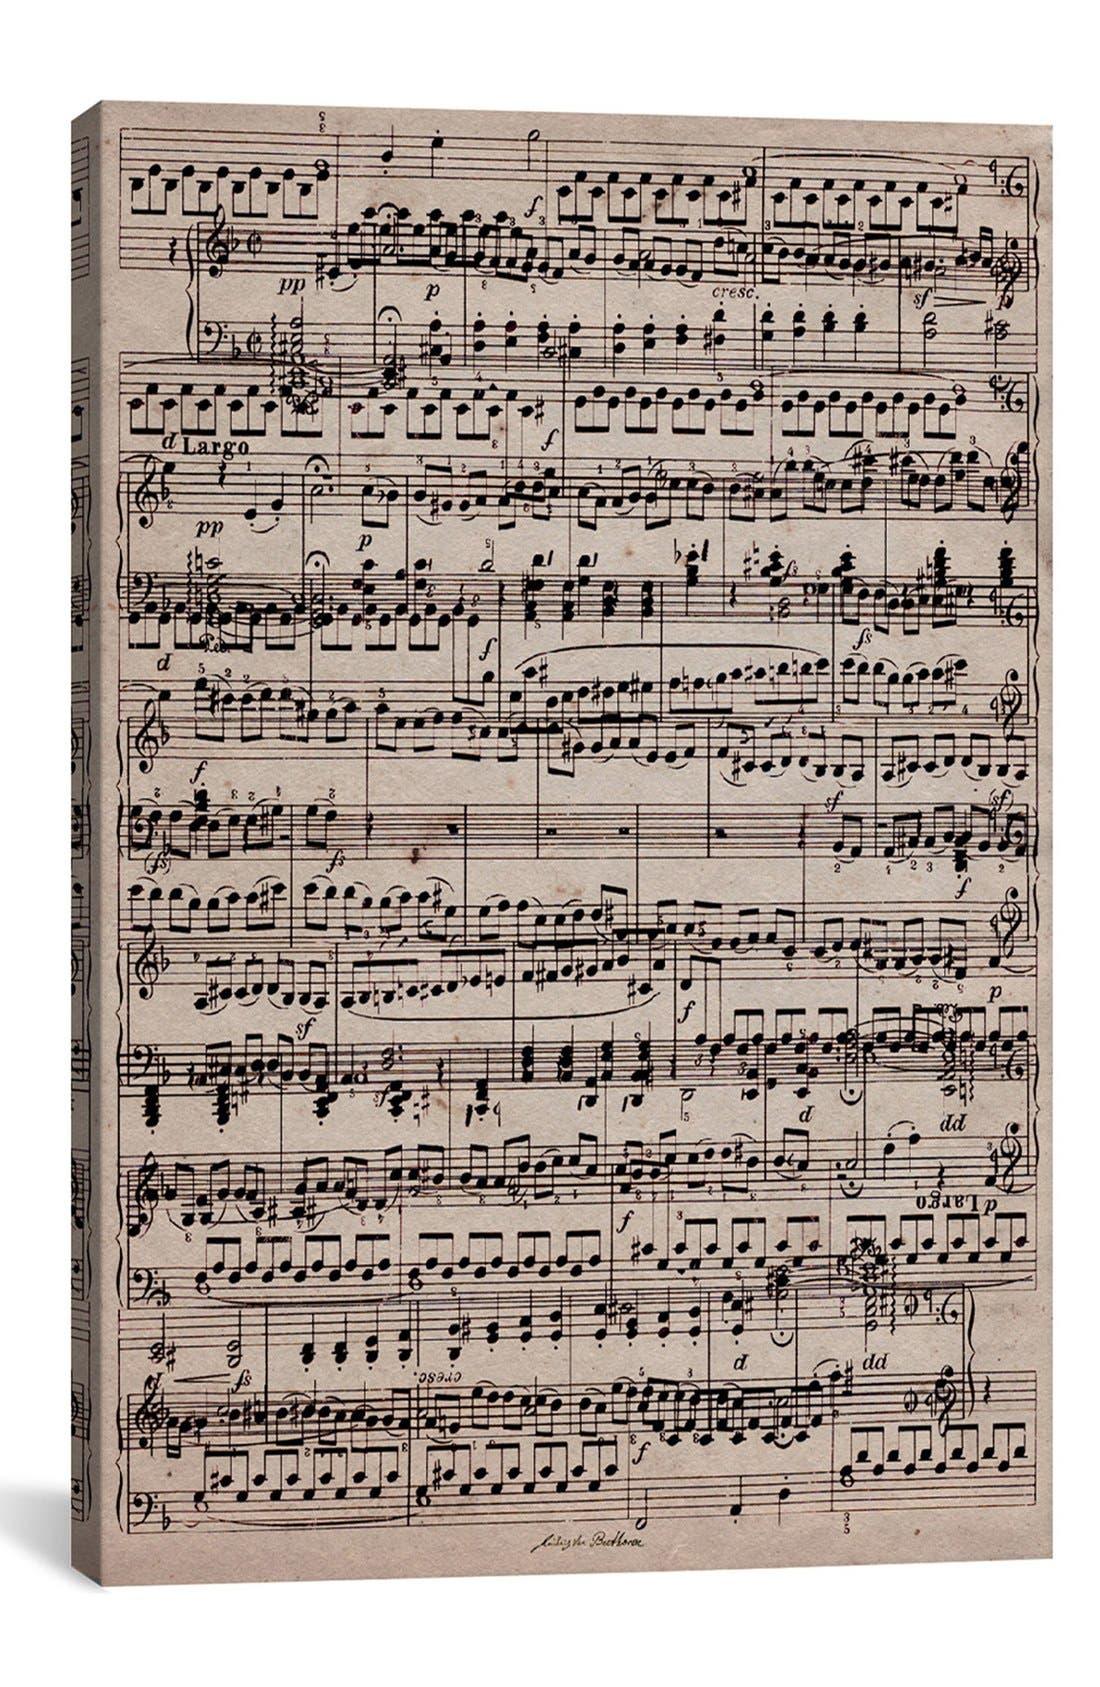 Icanvas 'Sheet Music' Giclee Print Canvas Art, Size 26x40 - Beige